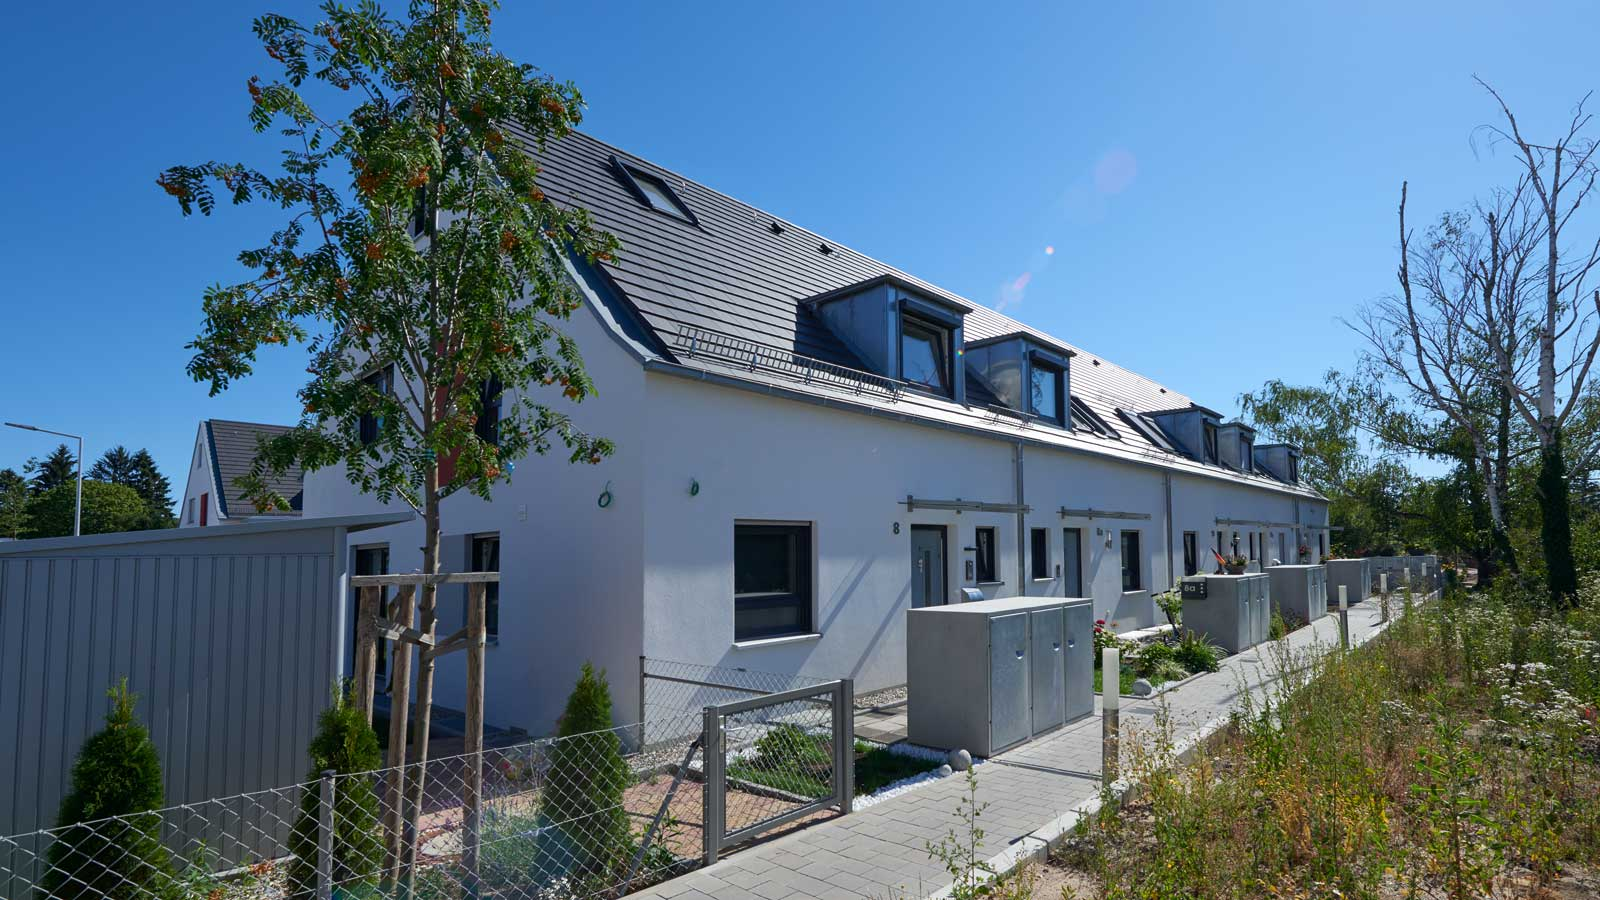 Reihenhaus In Nürnberg Schultheiss Wohnbau Ag